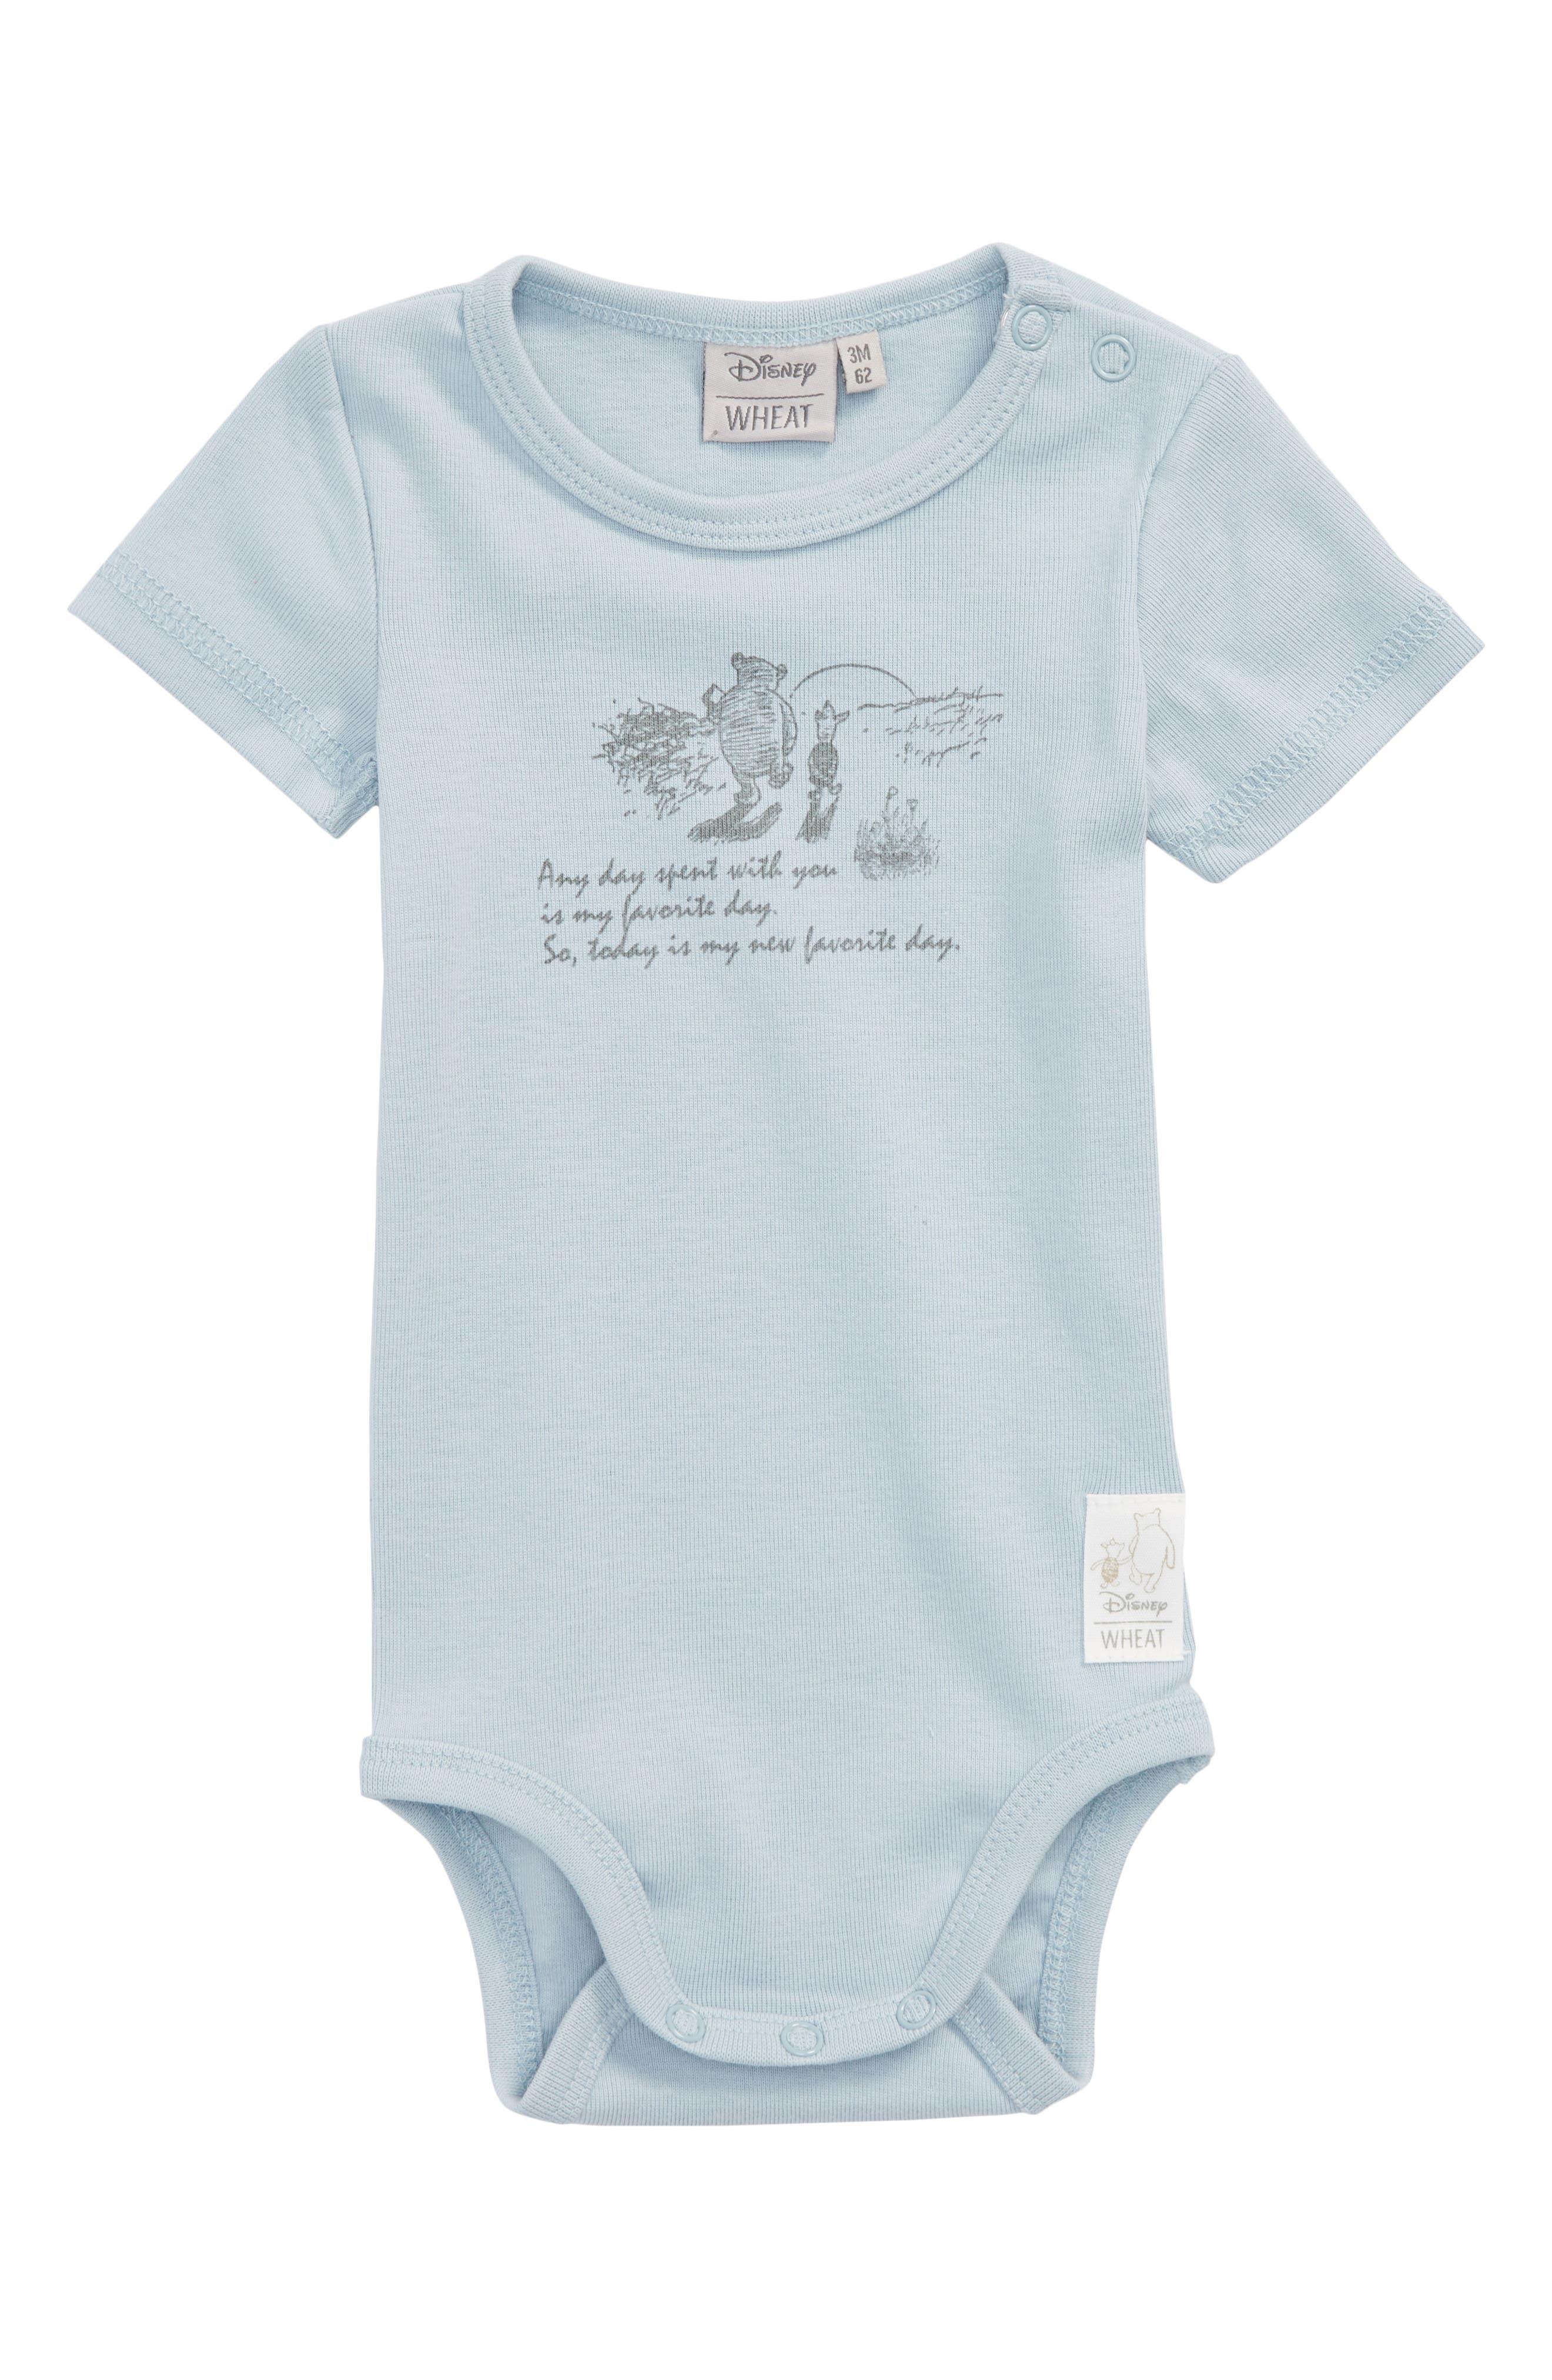 x Disney<sup>®</sup> Winnie the Pooh - Favorite Day Organic Cotton Bodysuit,                         Main,                         color, 403